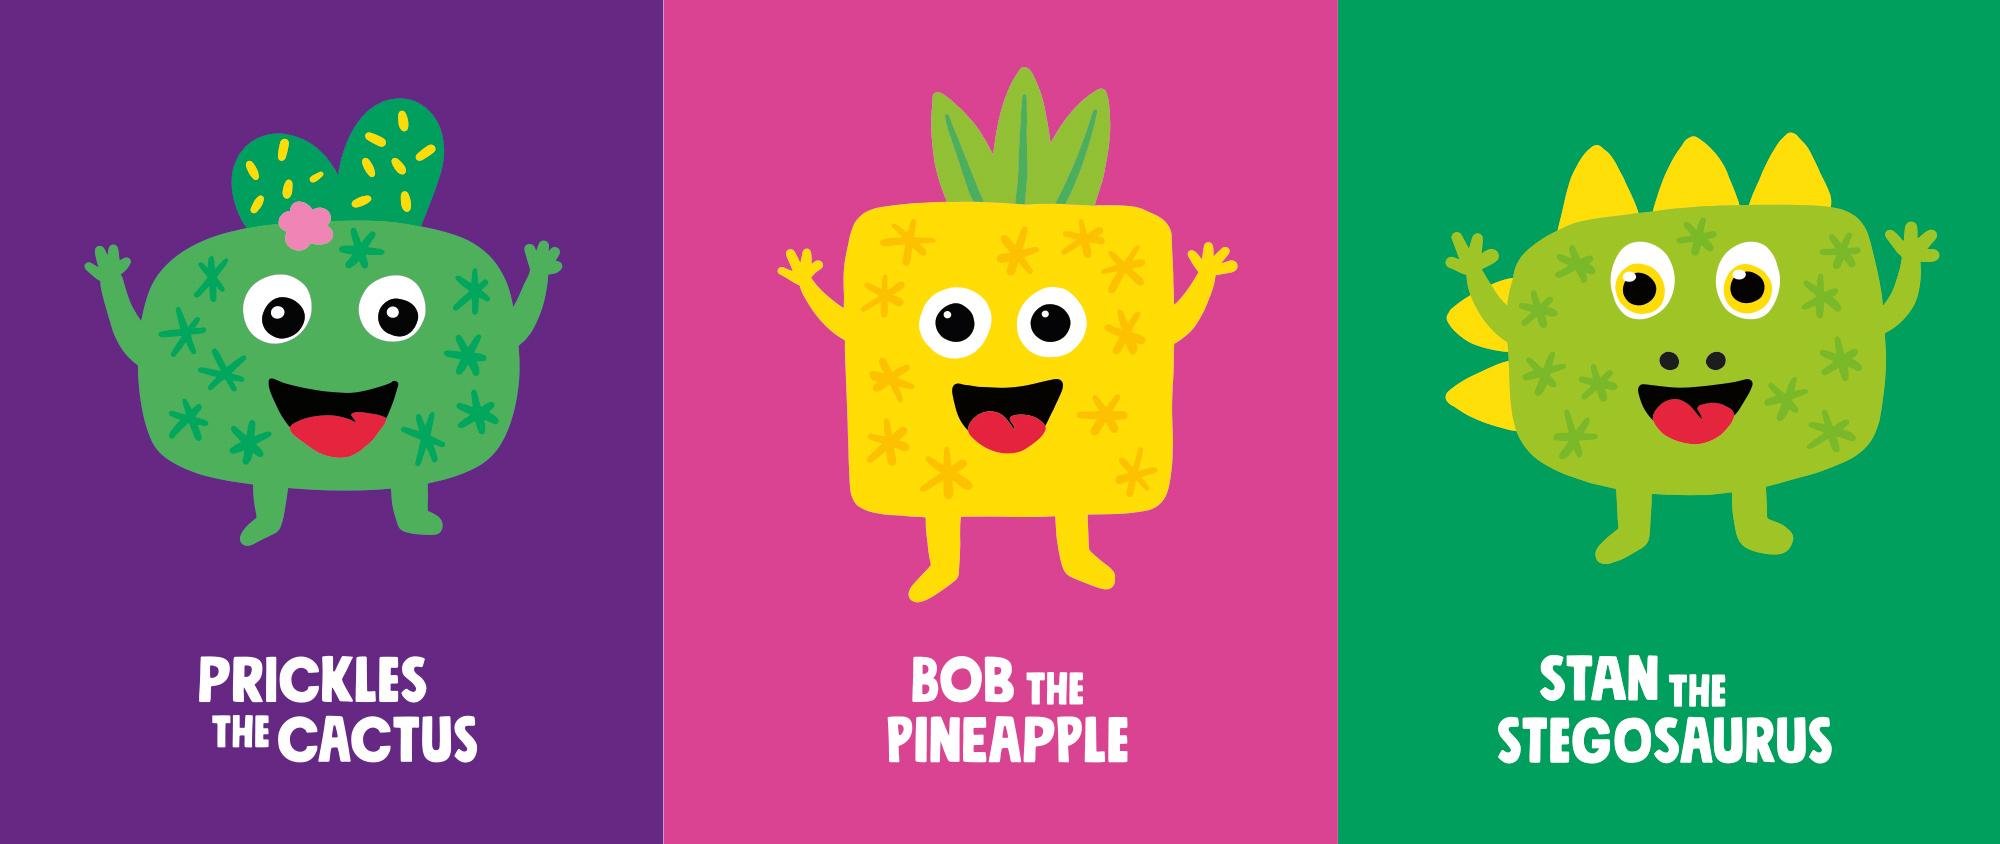 Big Spoon logo design and website design